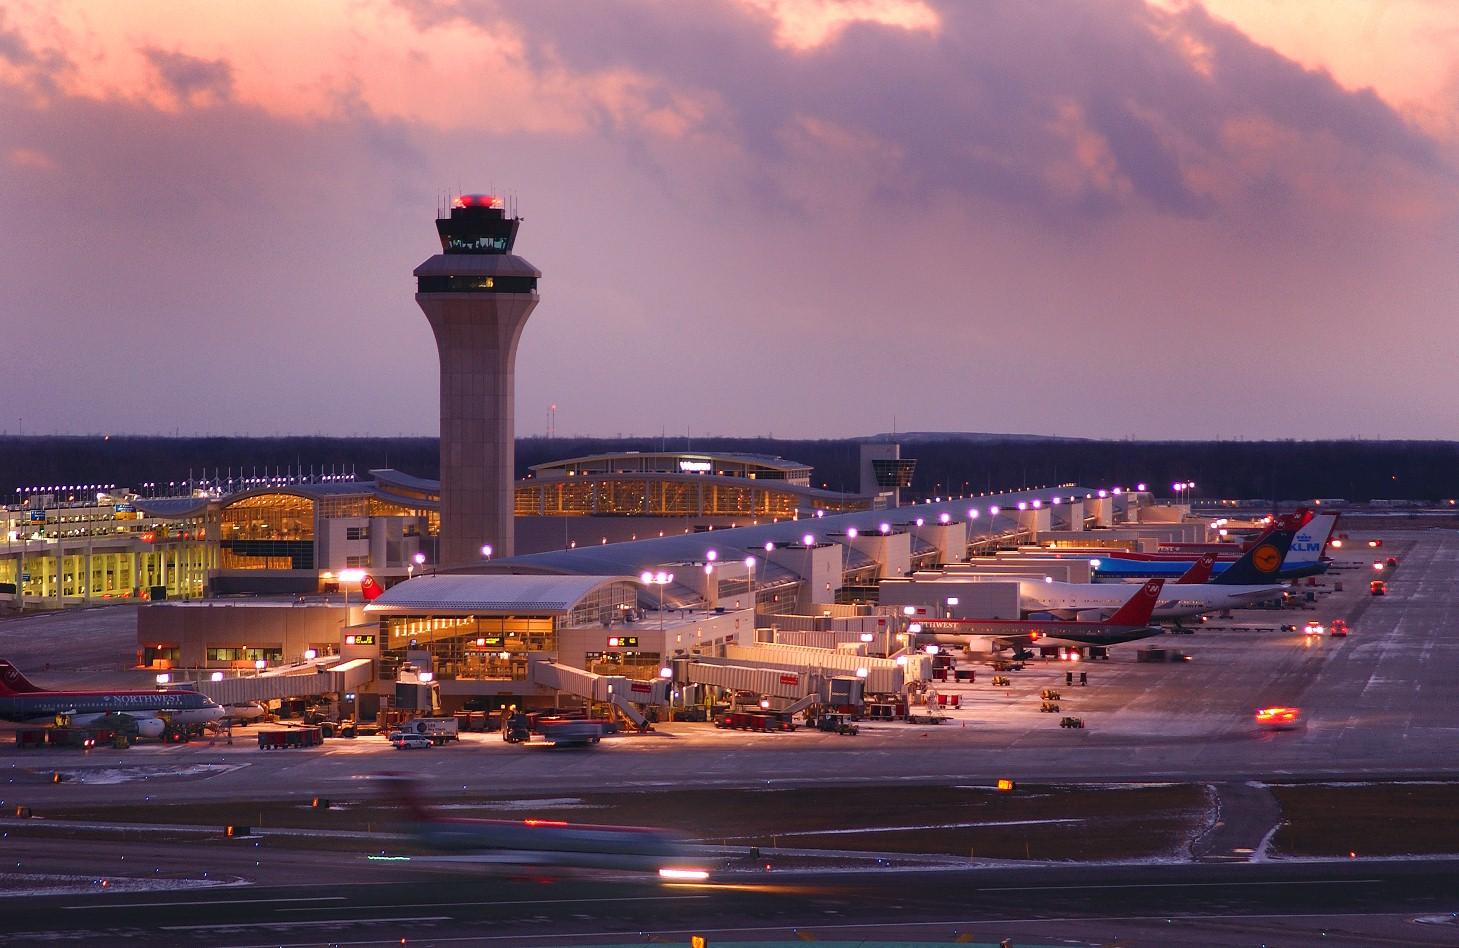 аэропорт Детройта